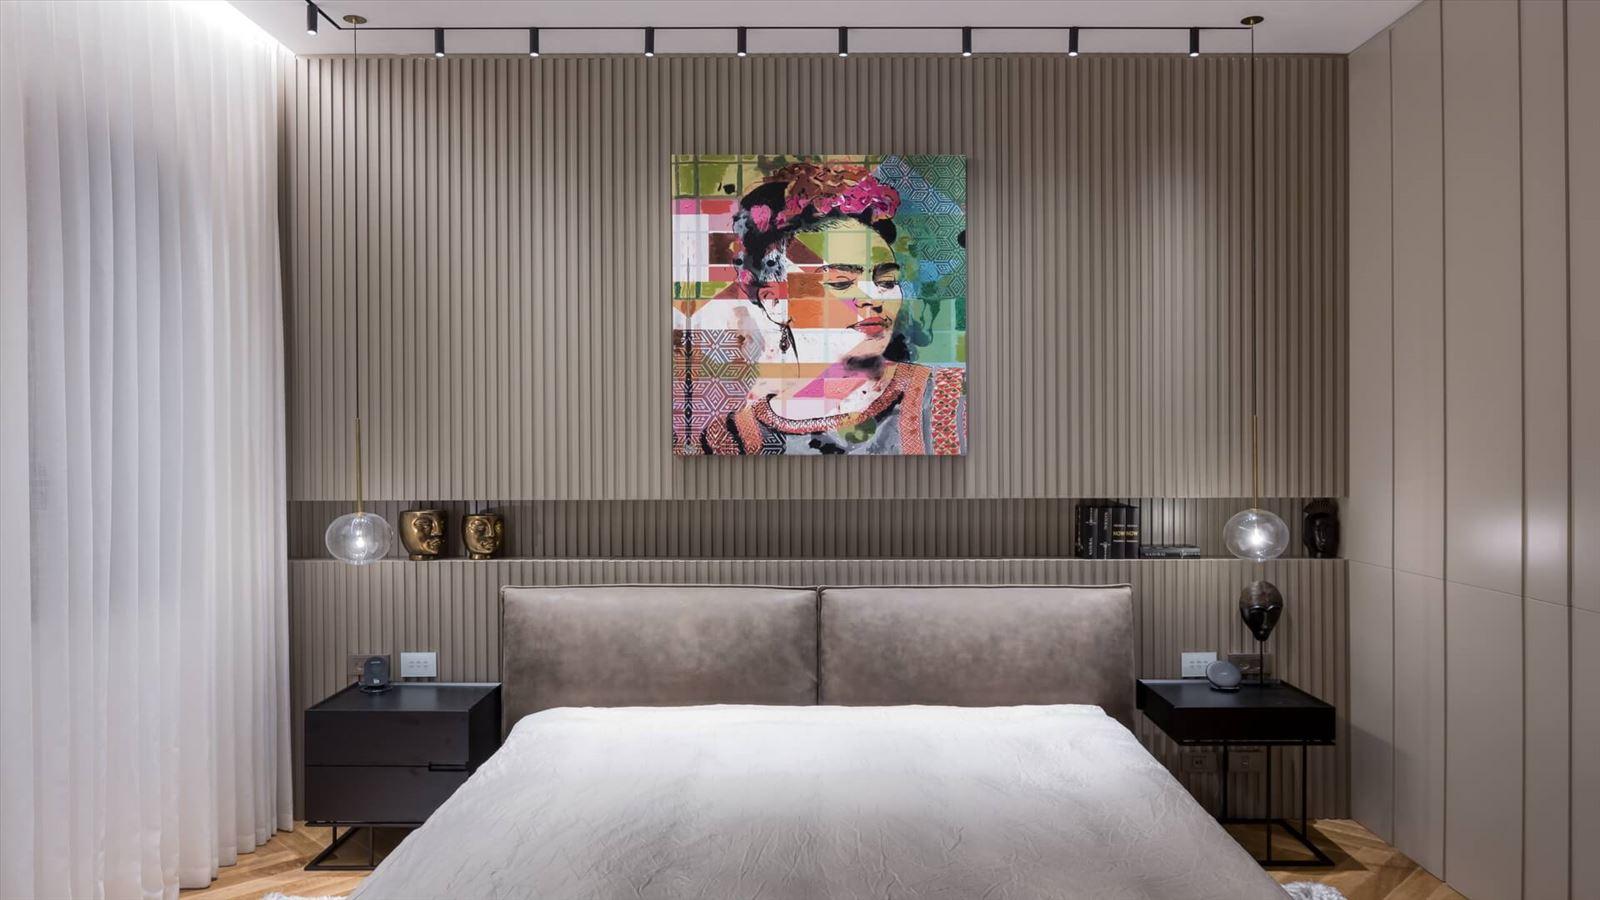 Penthouse Carmelit - תאורה אדריכלית מעוצבת בחדר השינה